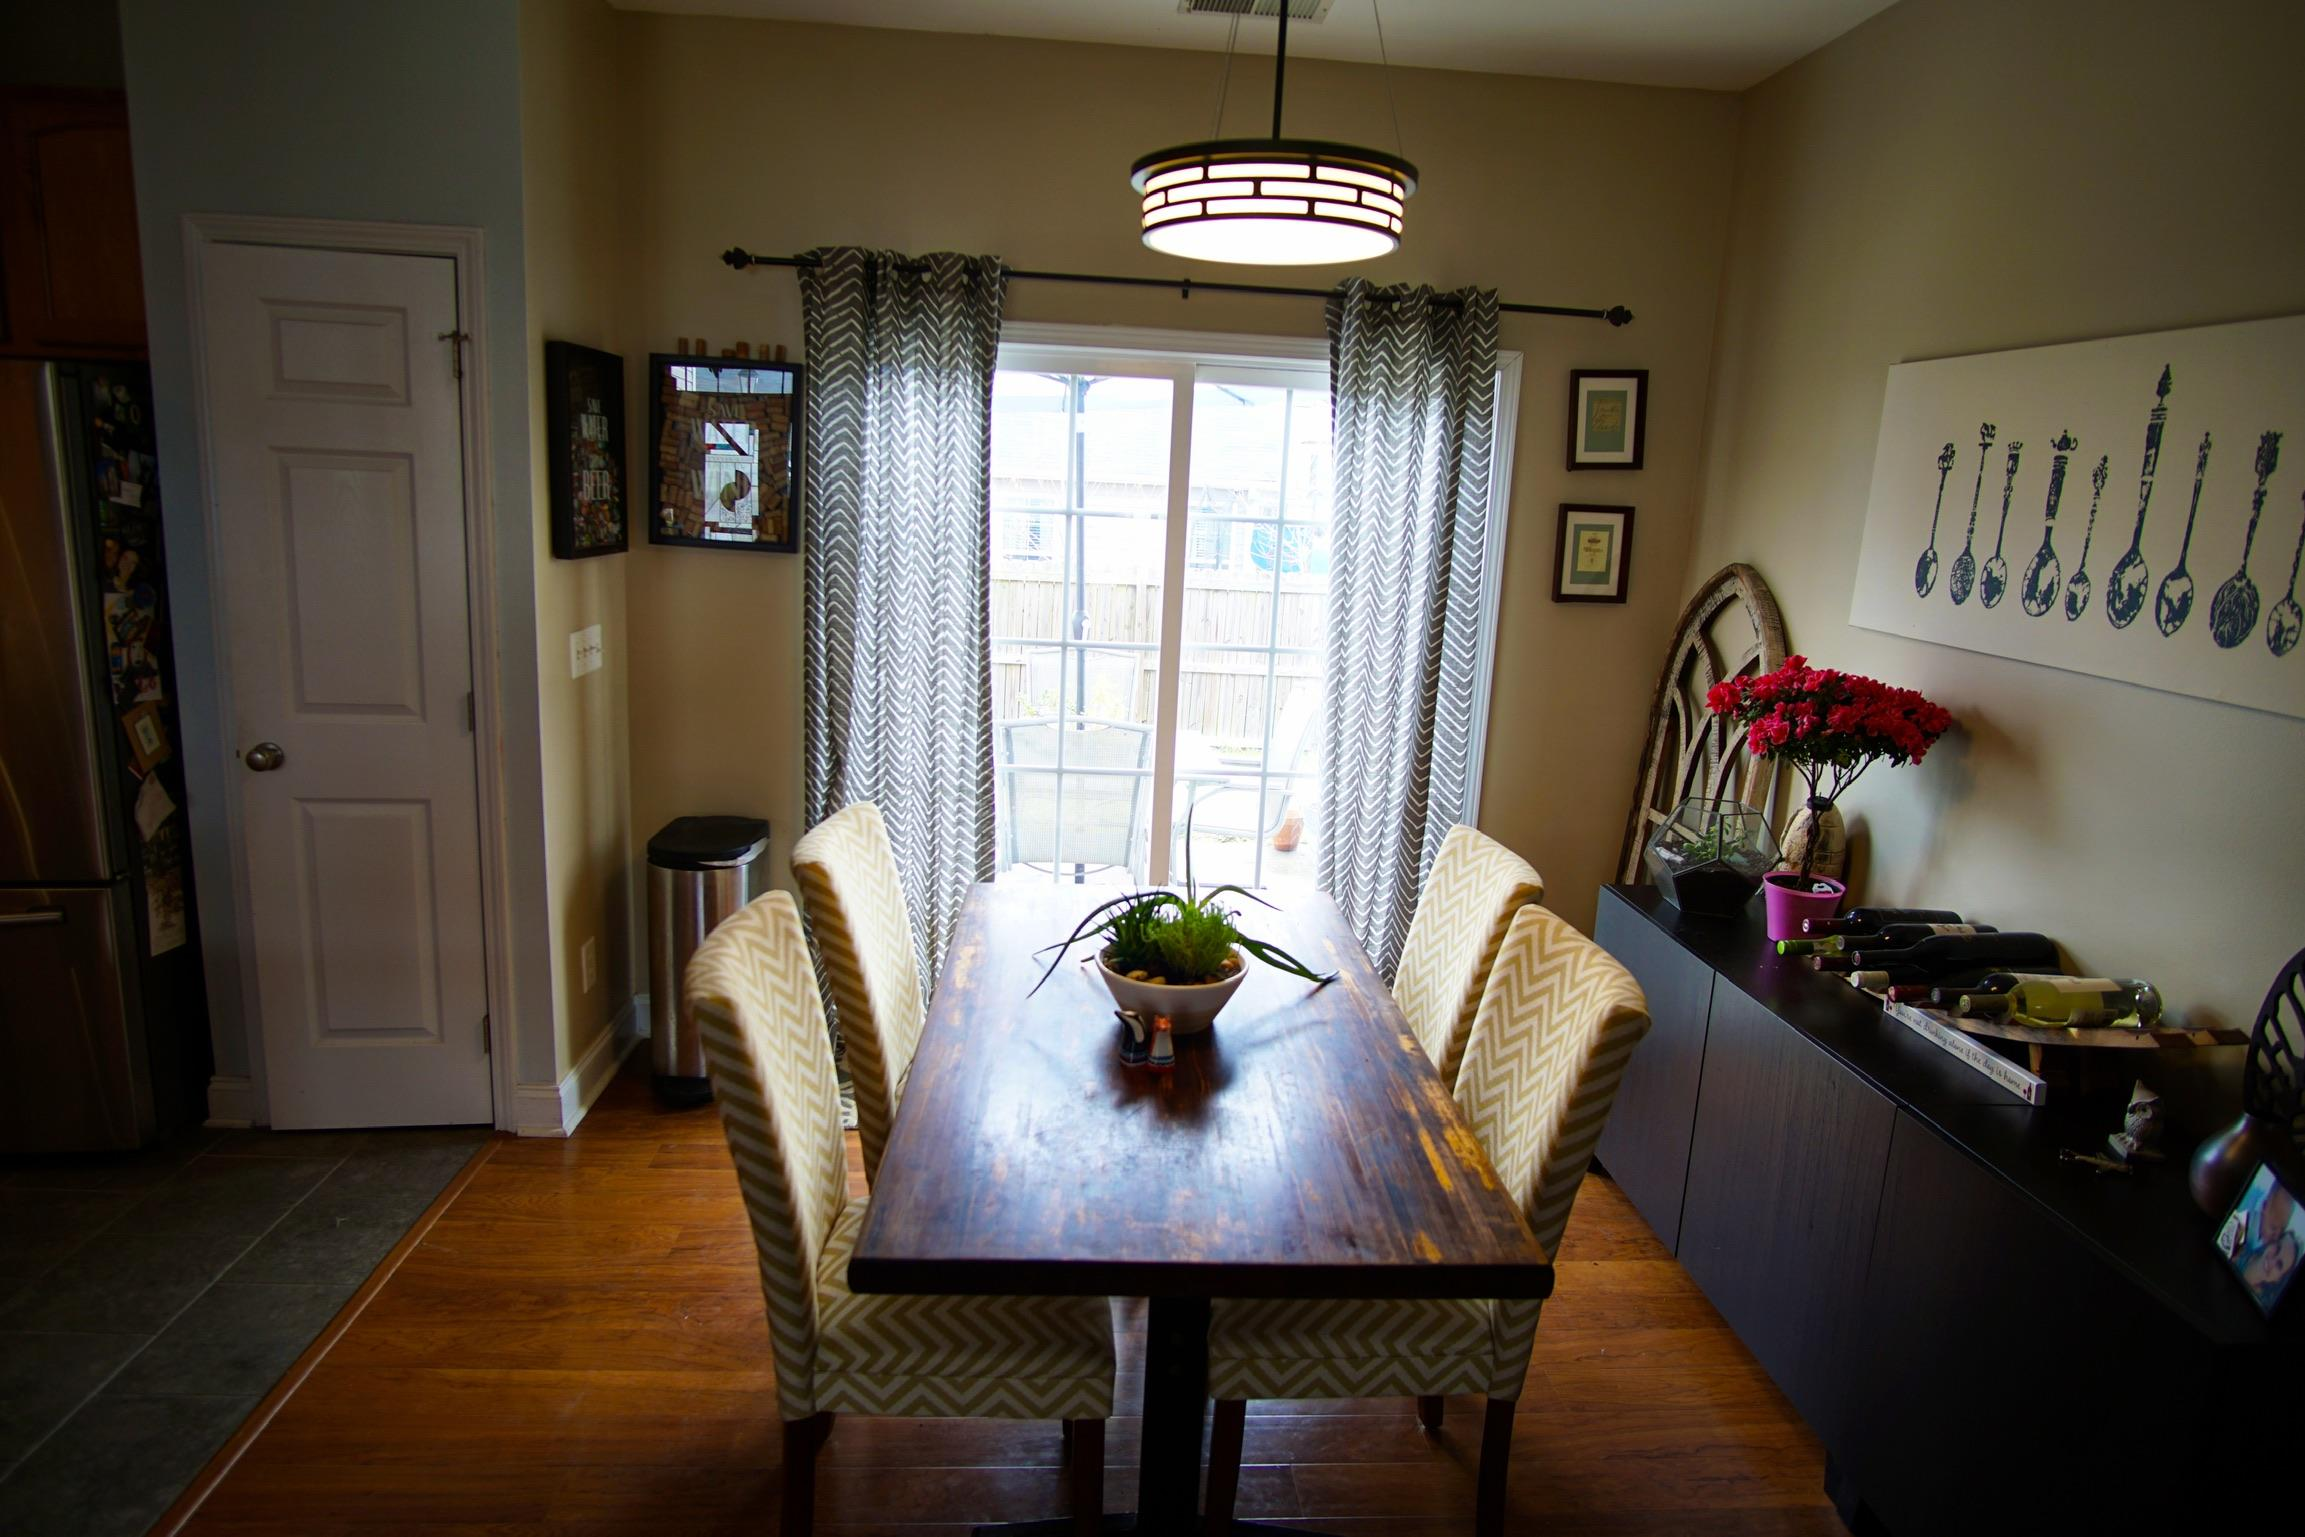 Colony North II Homes For Sale - 7828 Magellan, North Charleston, SC - 17